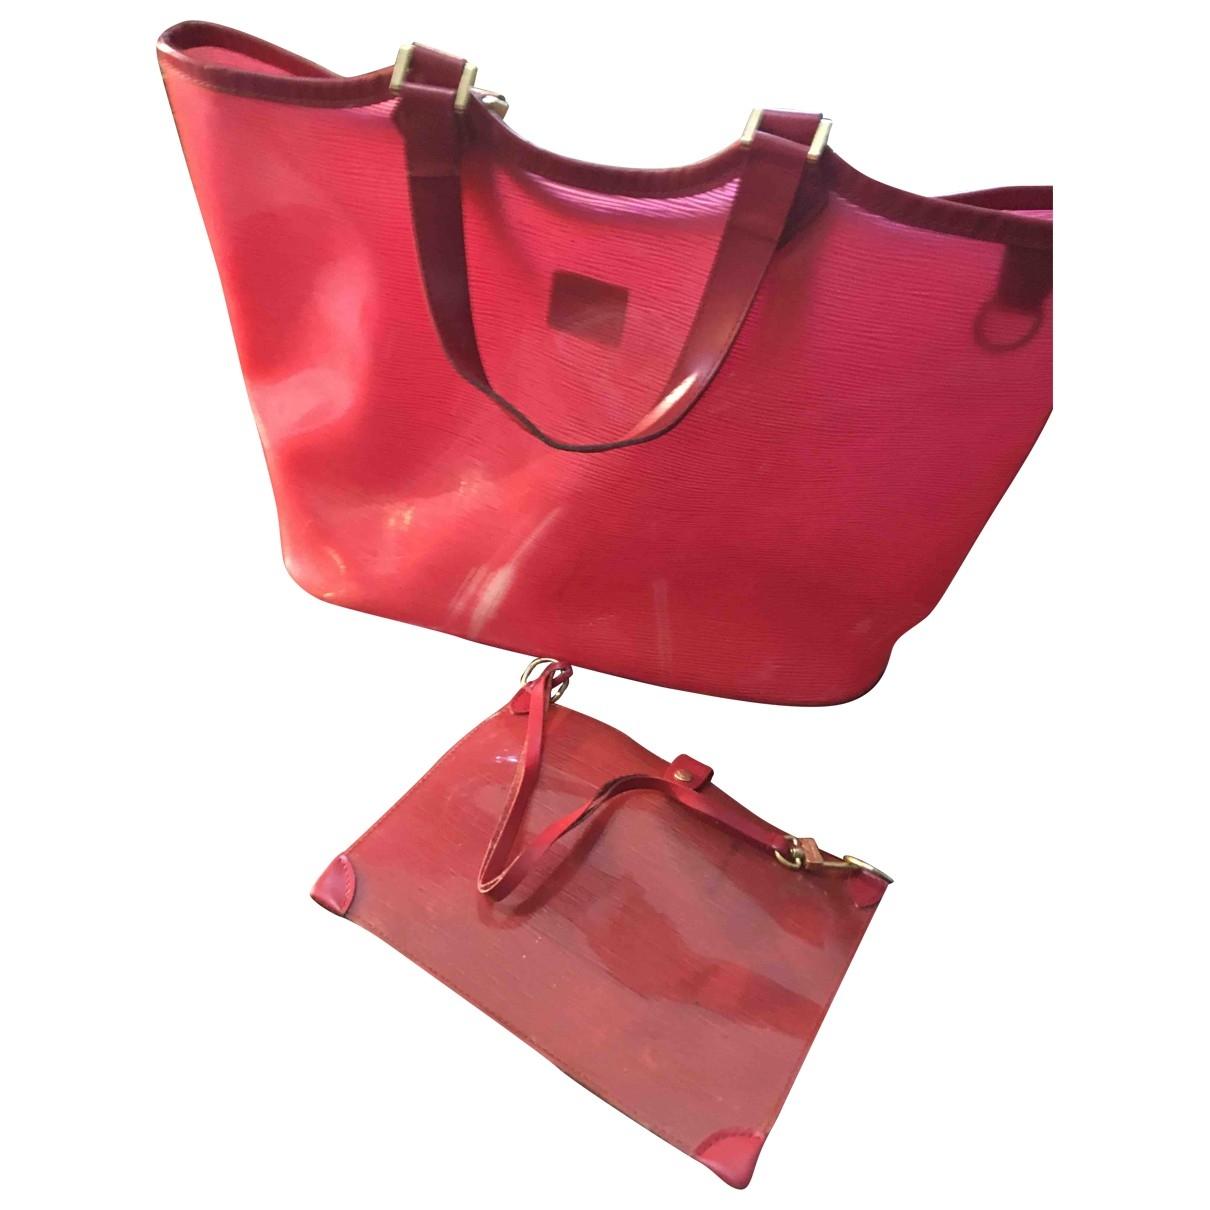 Louis Vuitton \N Red handbag for Women \N